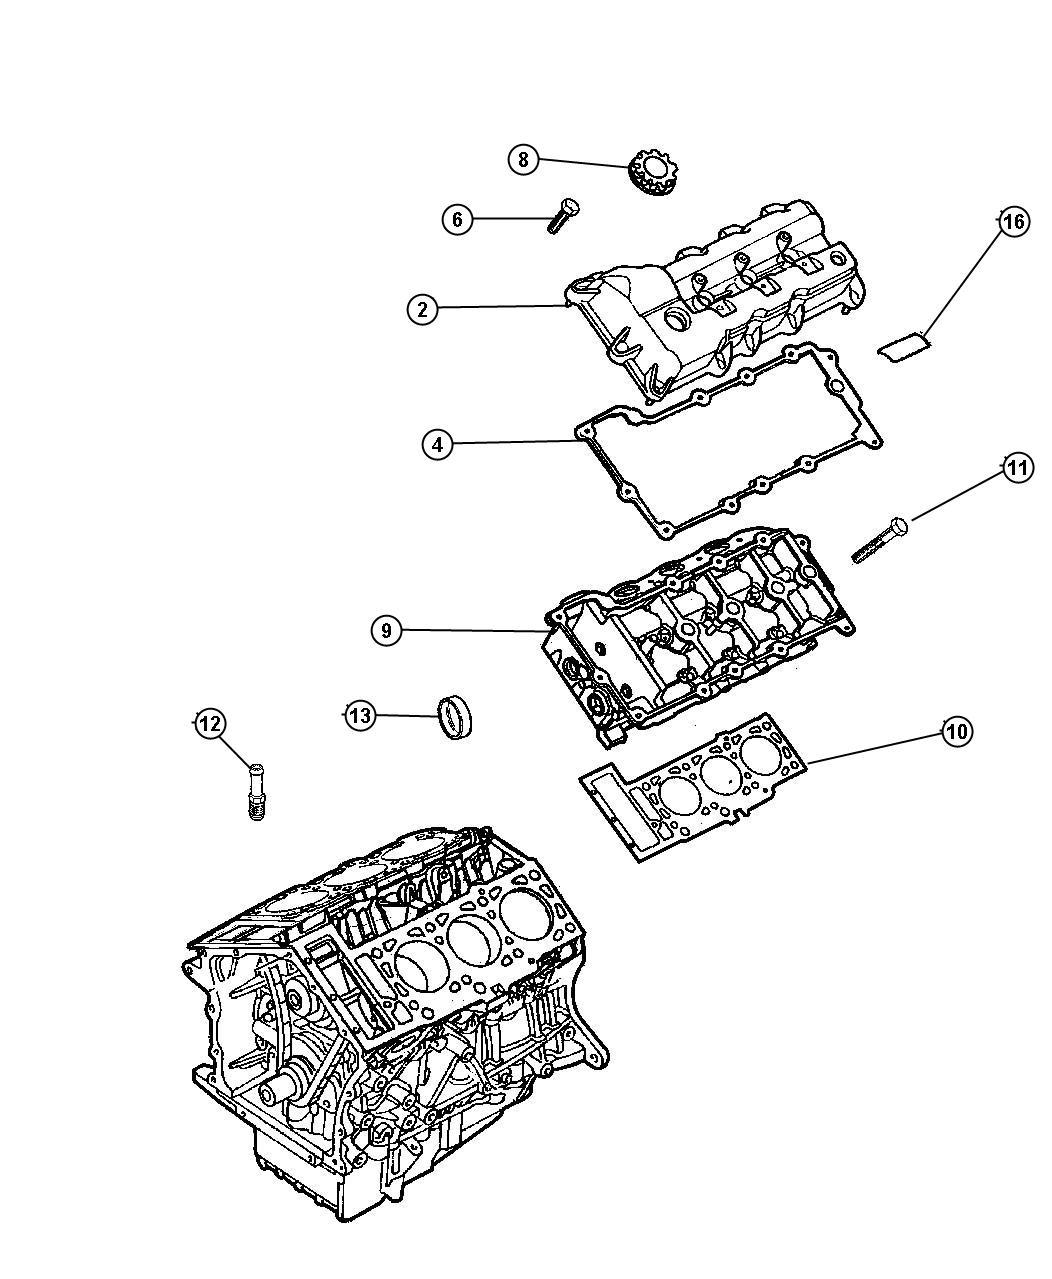 Dodge Intrepid Head Cylinder Right